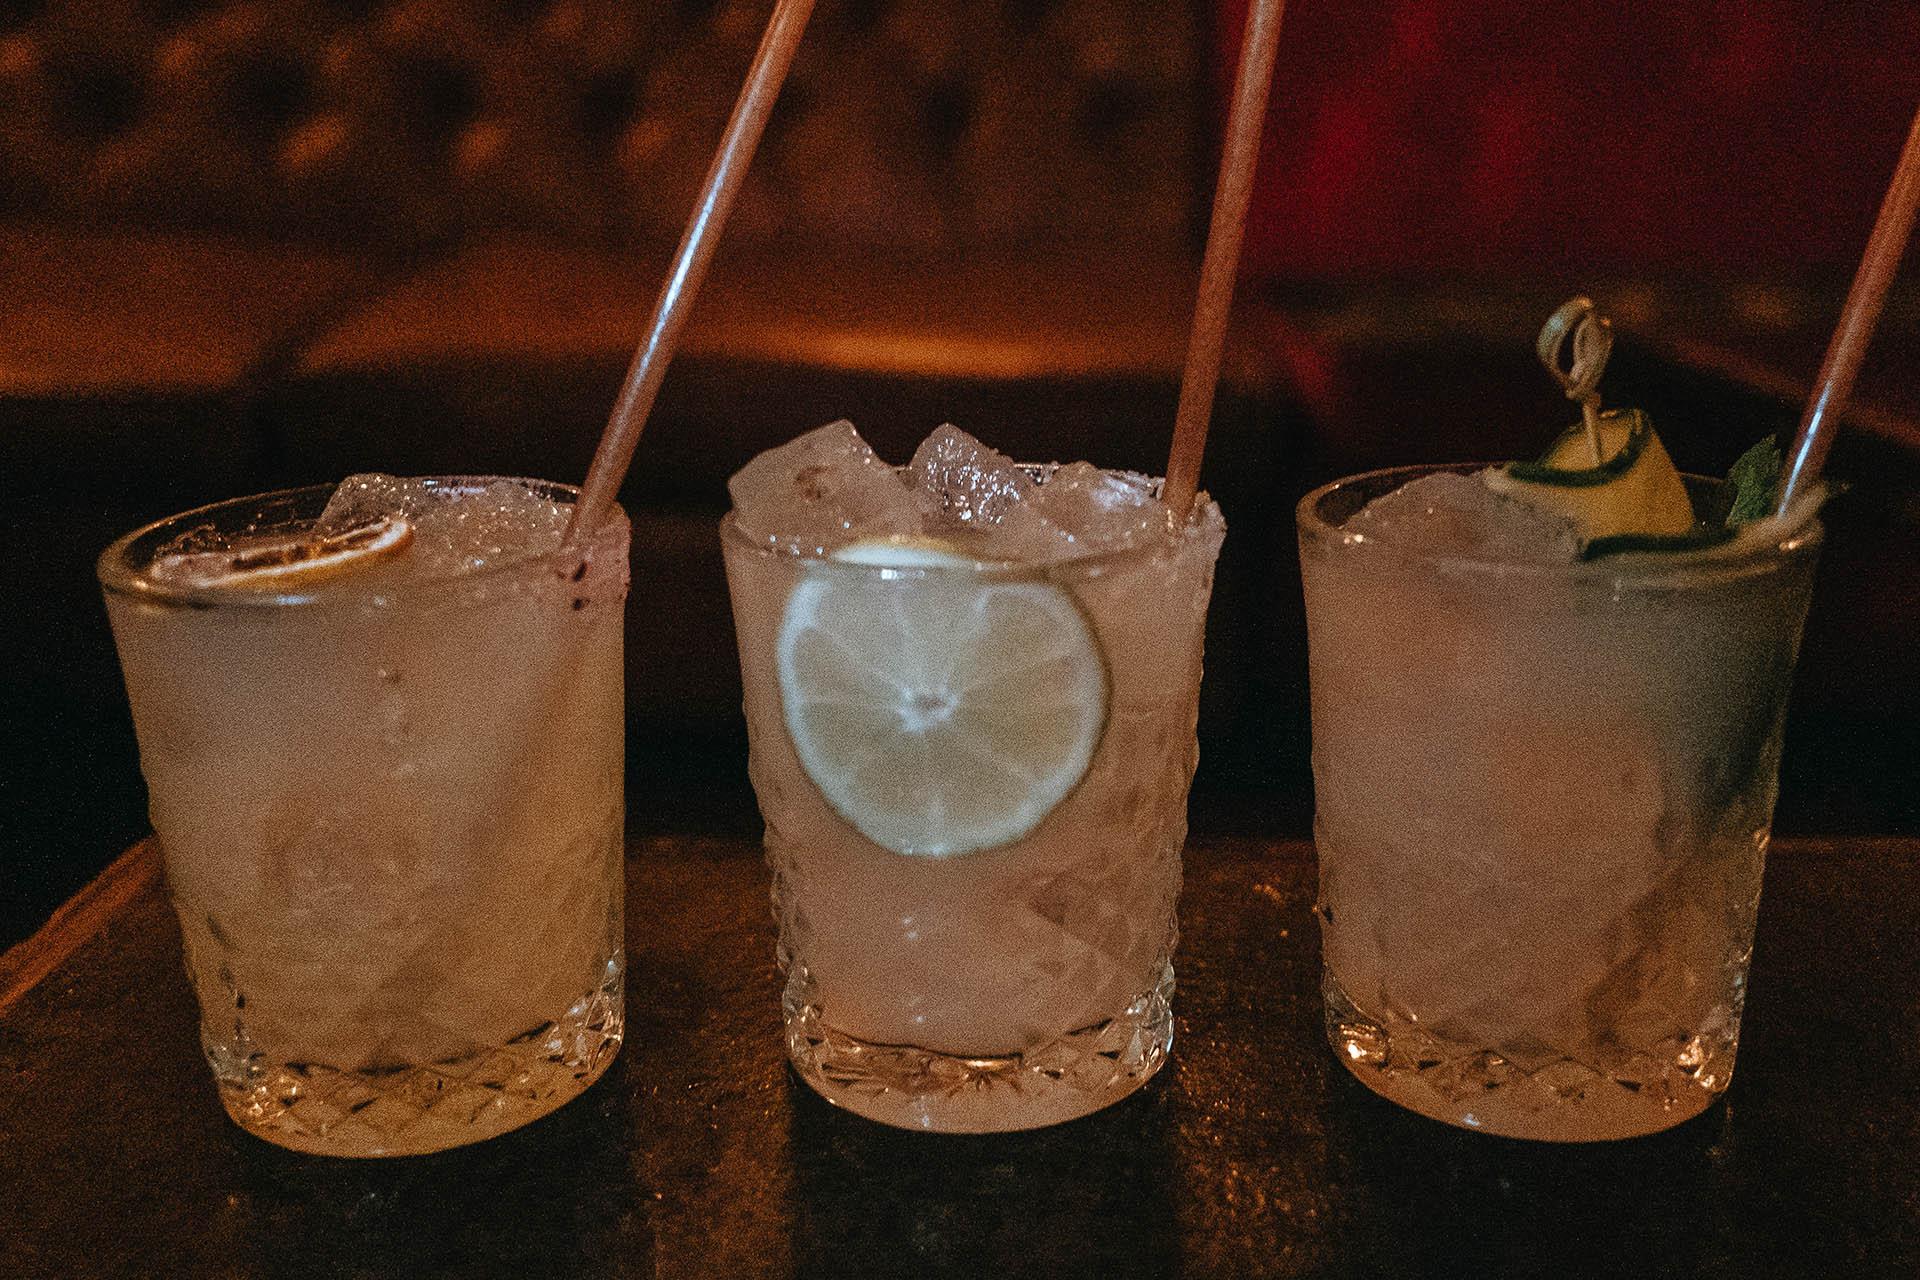 Trio of Margaritas from Bodega Miami